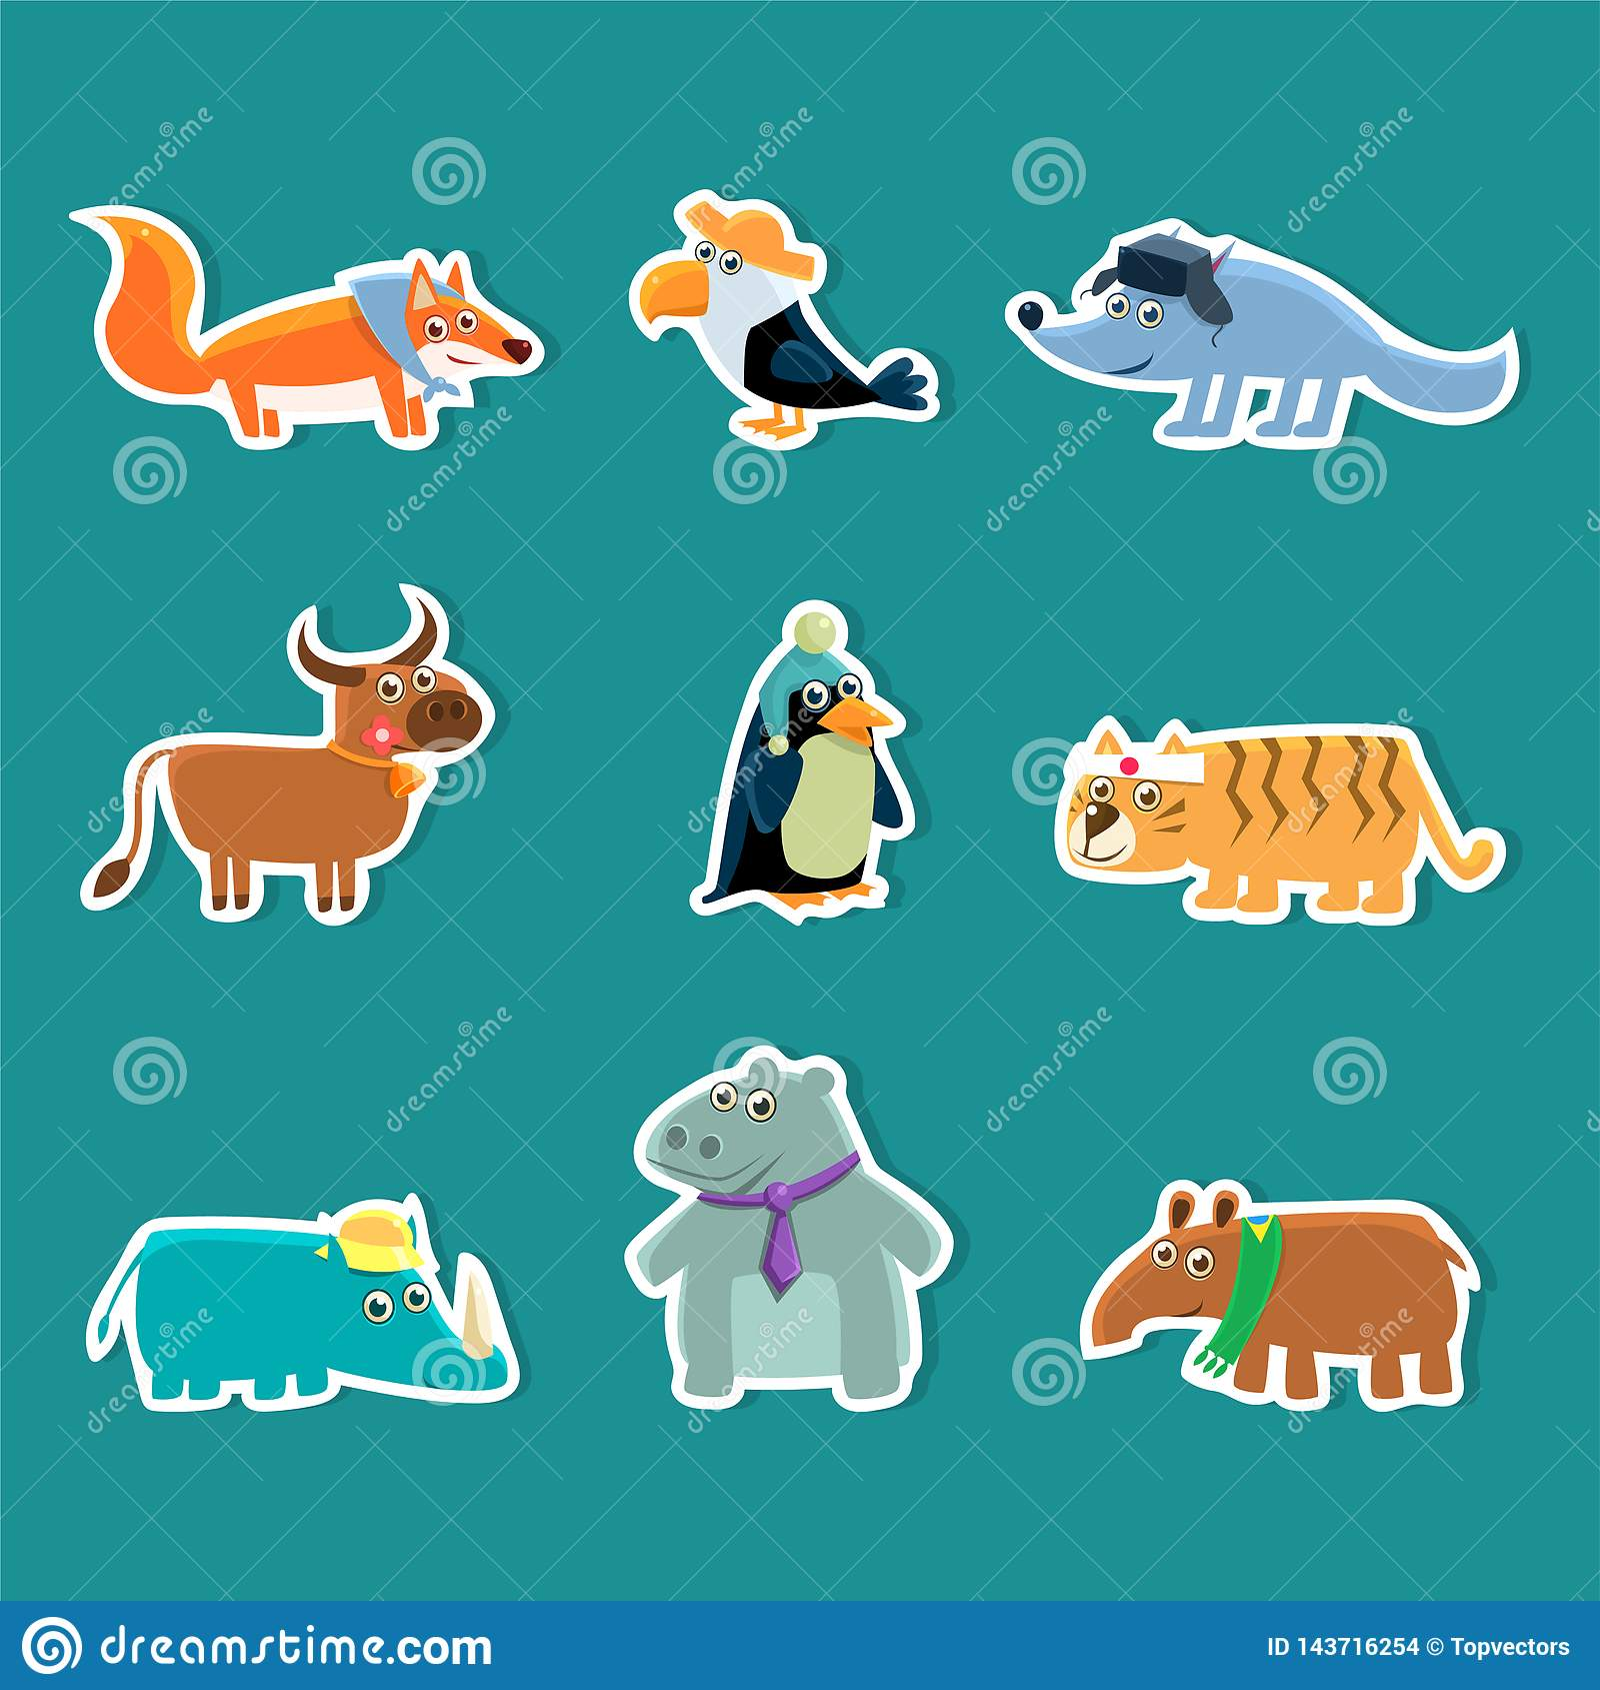 Sammlung nette Karikatur-Tieraufkleber, Fox, Tukan, Wolf, Kuh, Pinguin, Tiger, Nashorn, Nilpferd, Erdferkel-Vektor